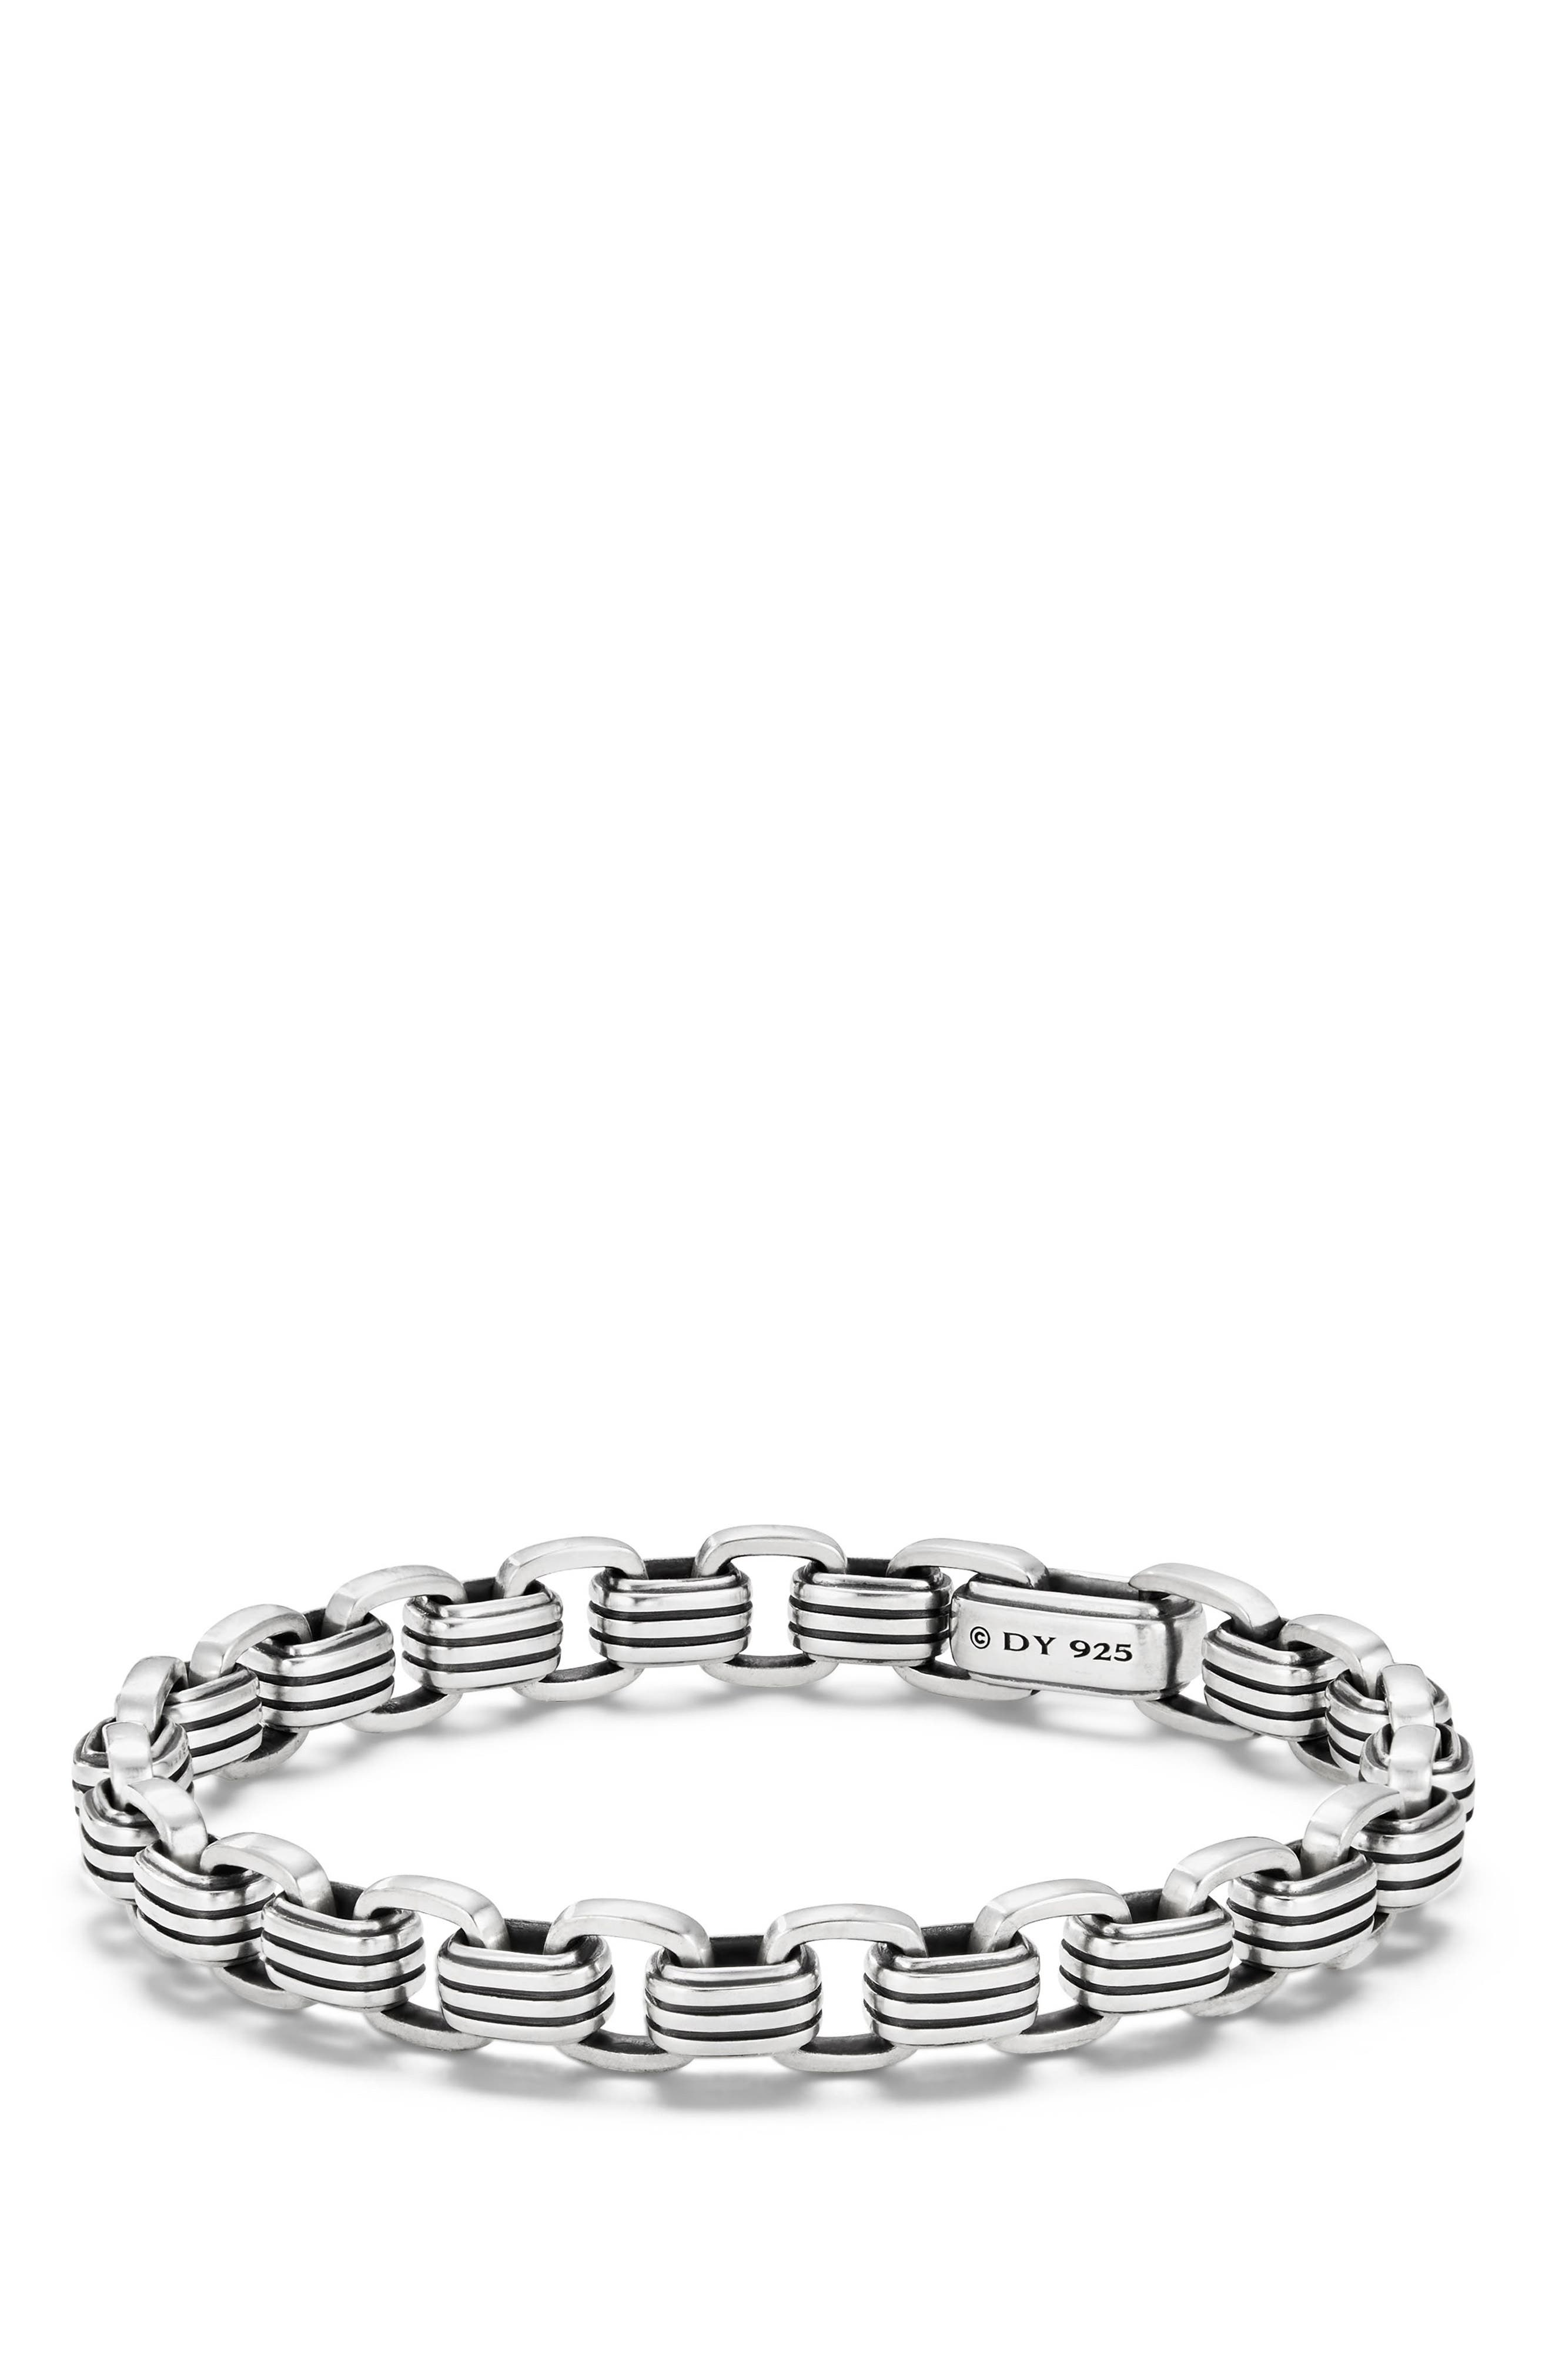 DAVID YURMAN Southwest Link Bracelet, Main, color, SILVER